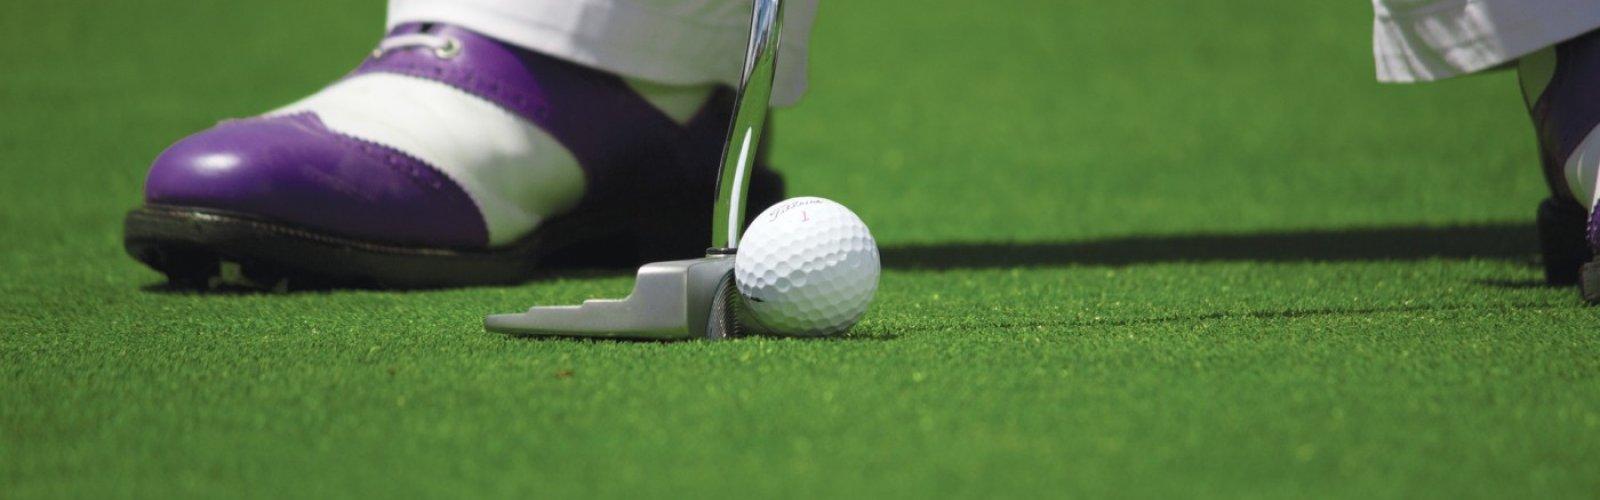 Golf-1284011 1920